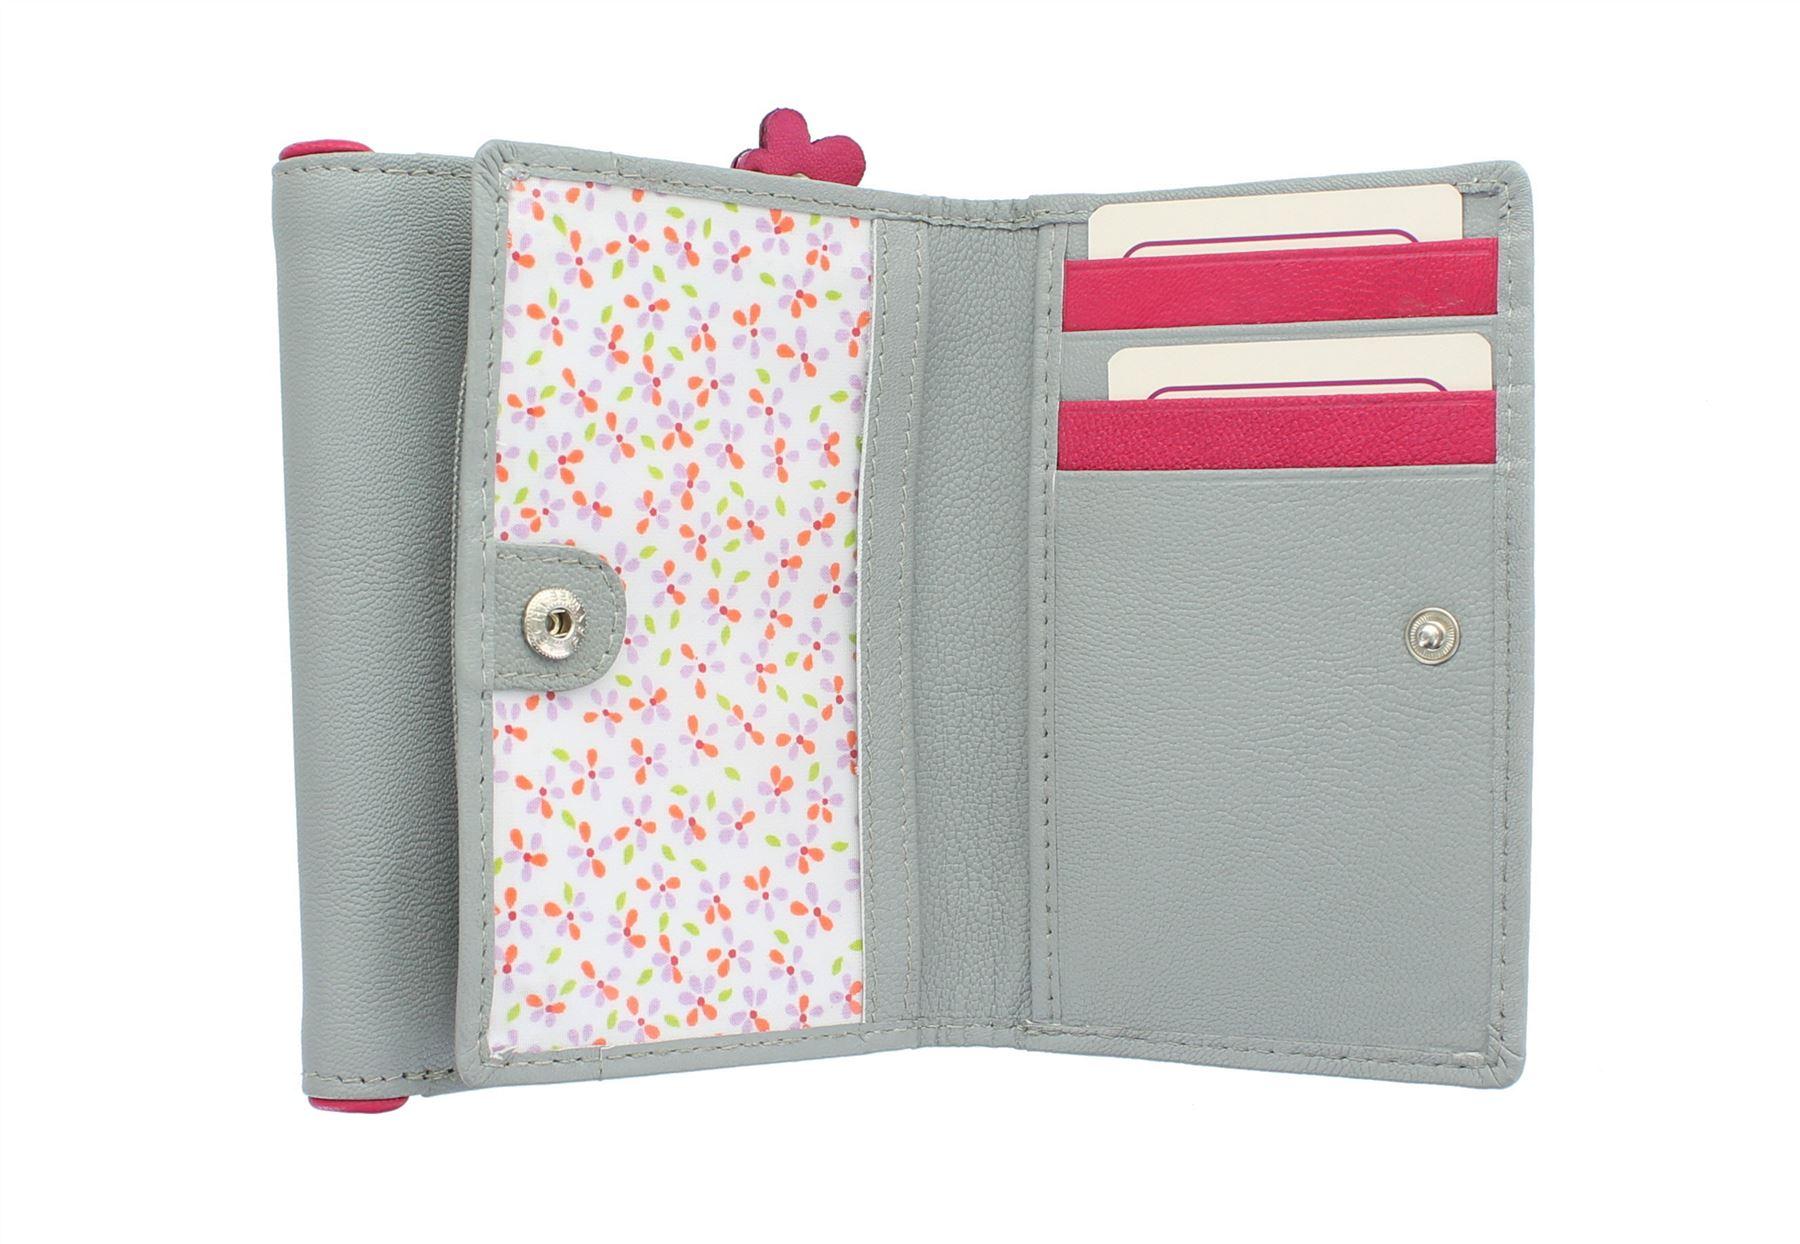 6 Leather esaurito pink Collection Zorro Mala 3420 Purse Grey AqXxUz